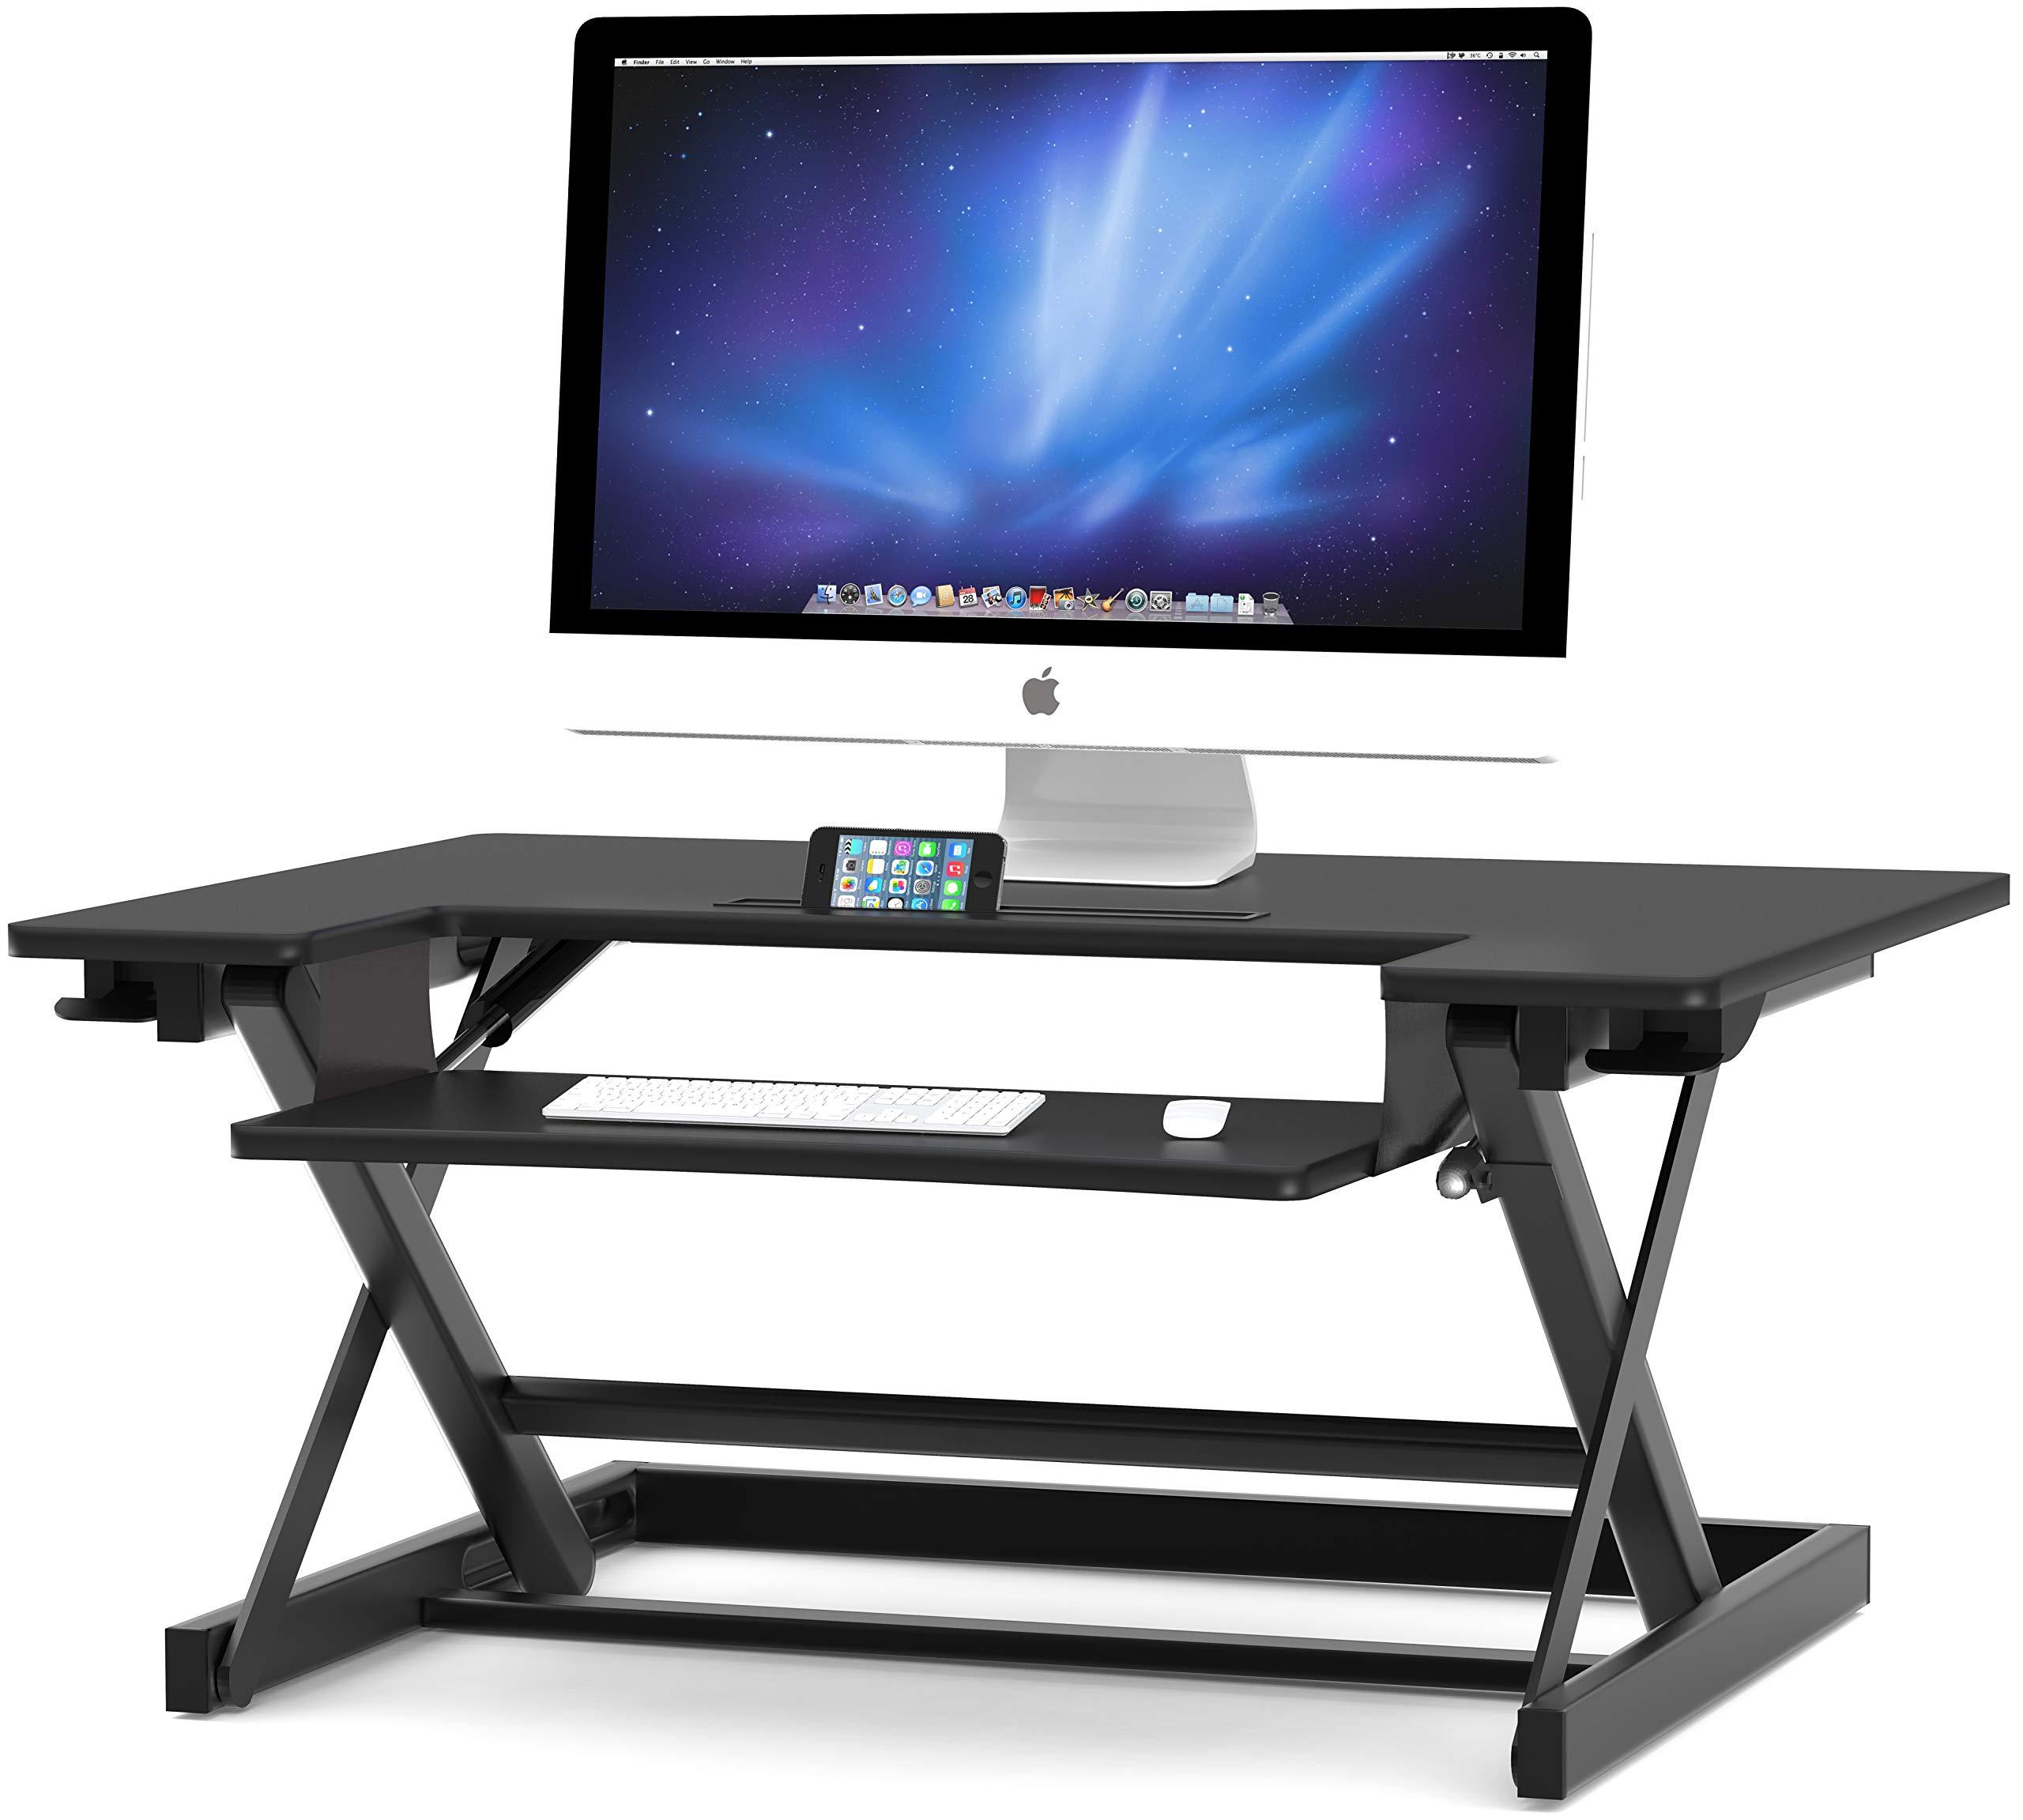 SHW Height Adjustable Sit to Stand Desk Riser Converter Workstation, Black by SHW (Image #4)